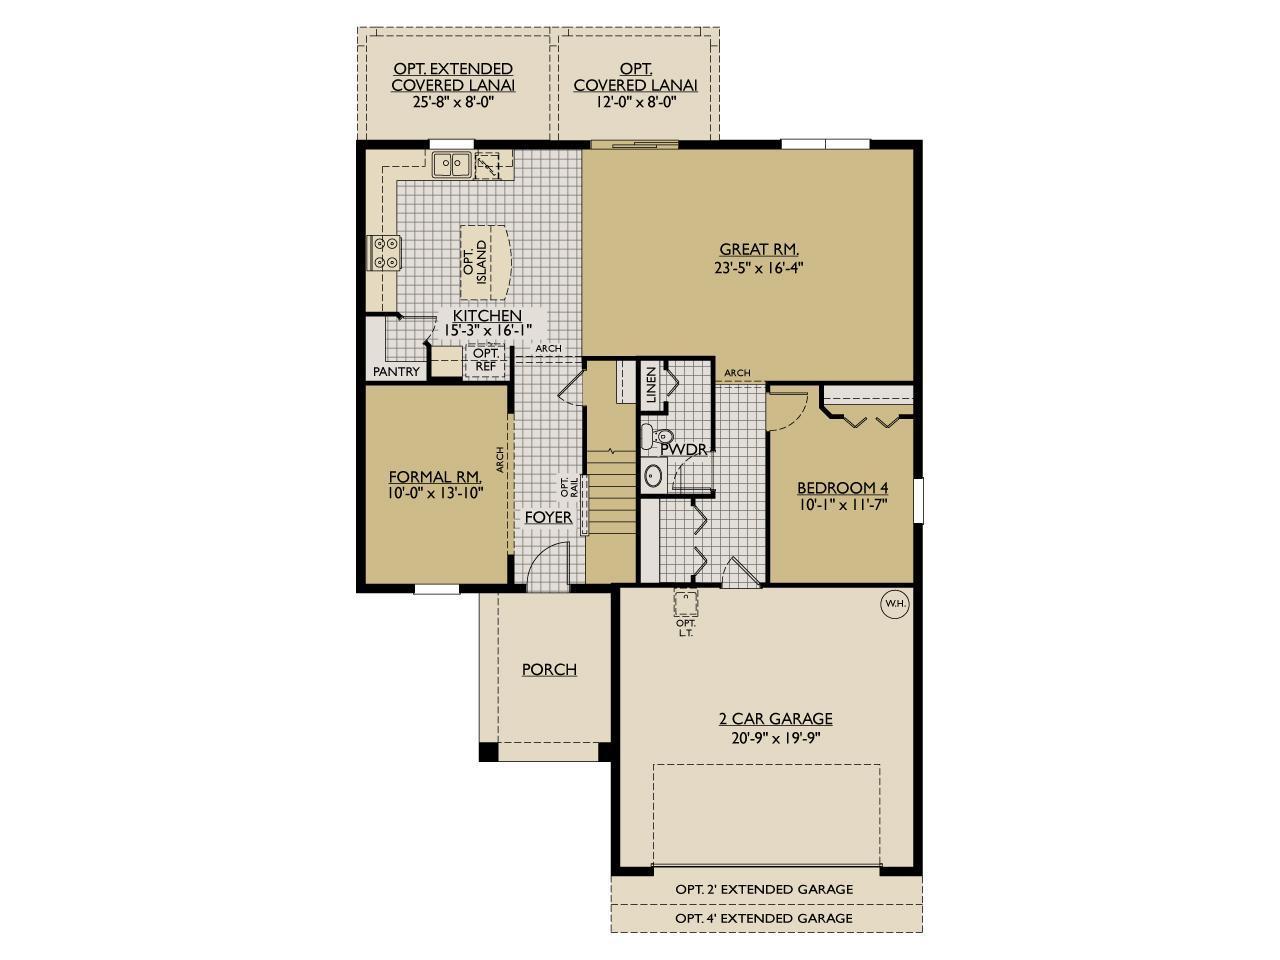 Saratoga New Home Floor Plan – William Ryan Homes Floor Plans